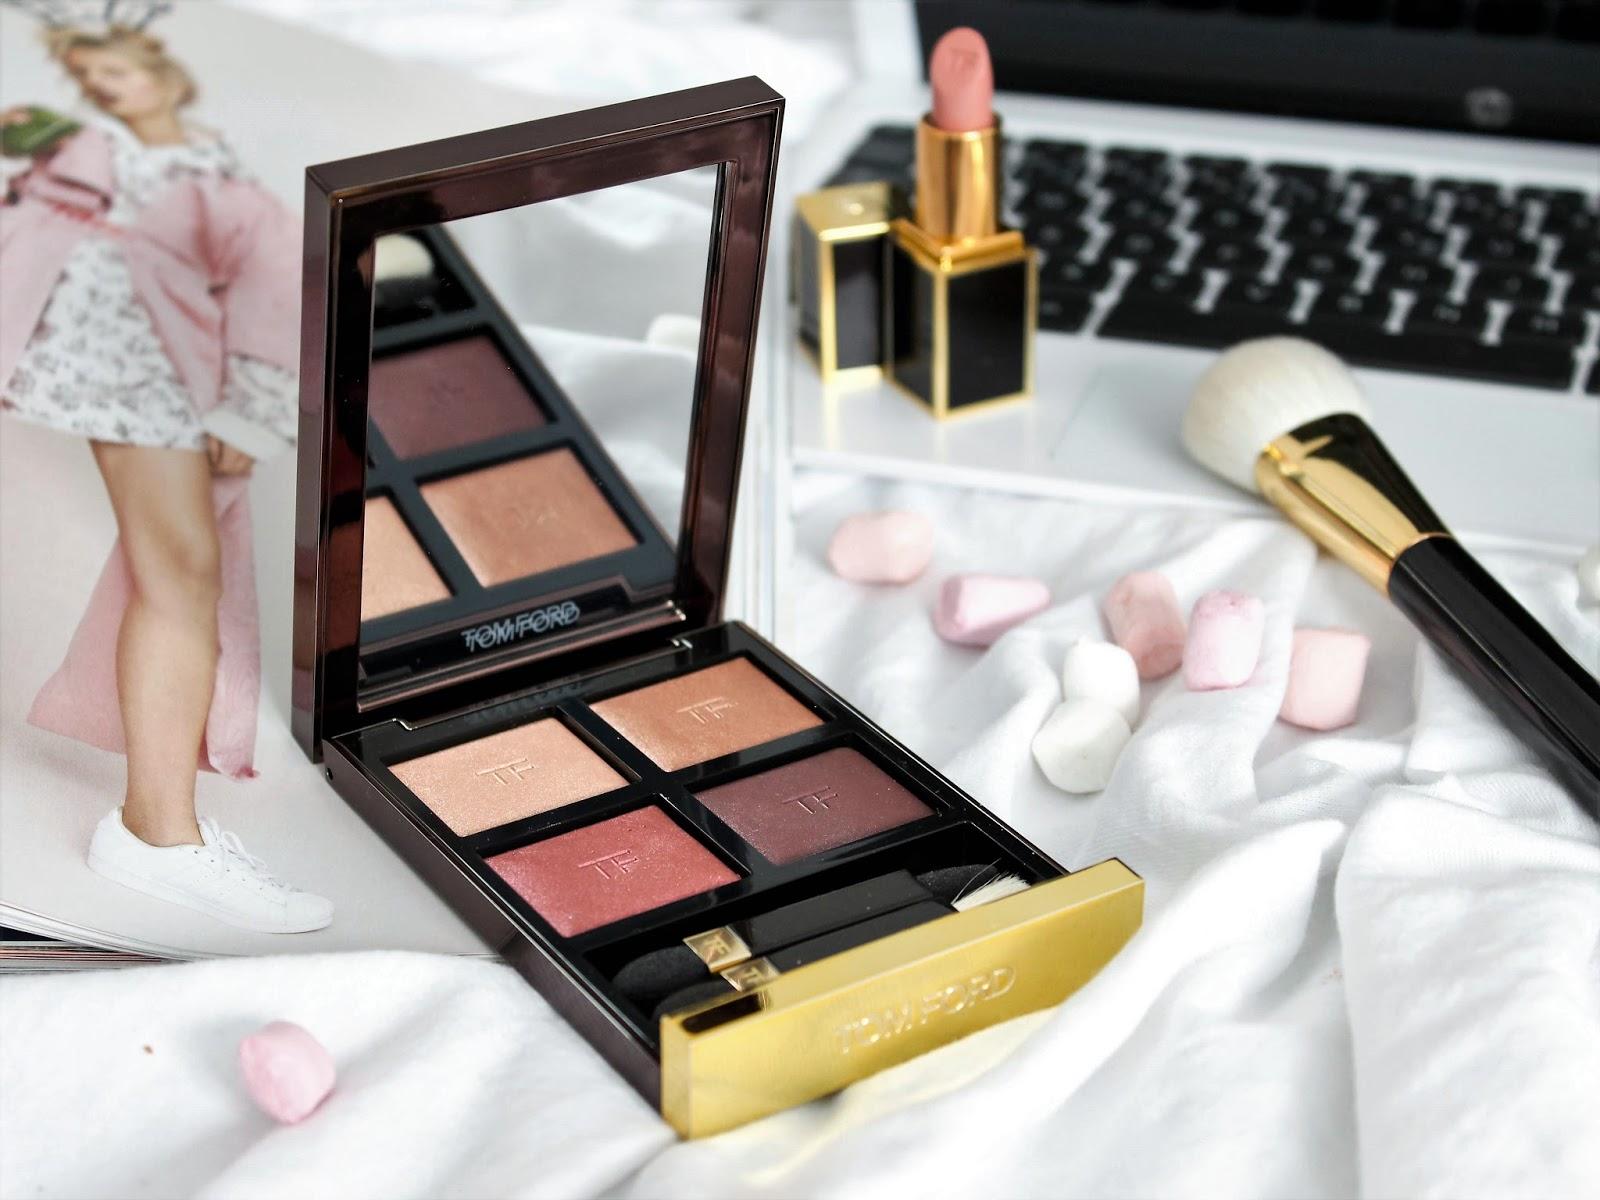 český blog o kosmetice